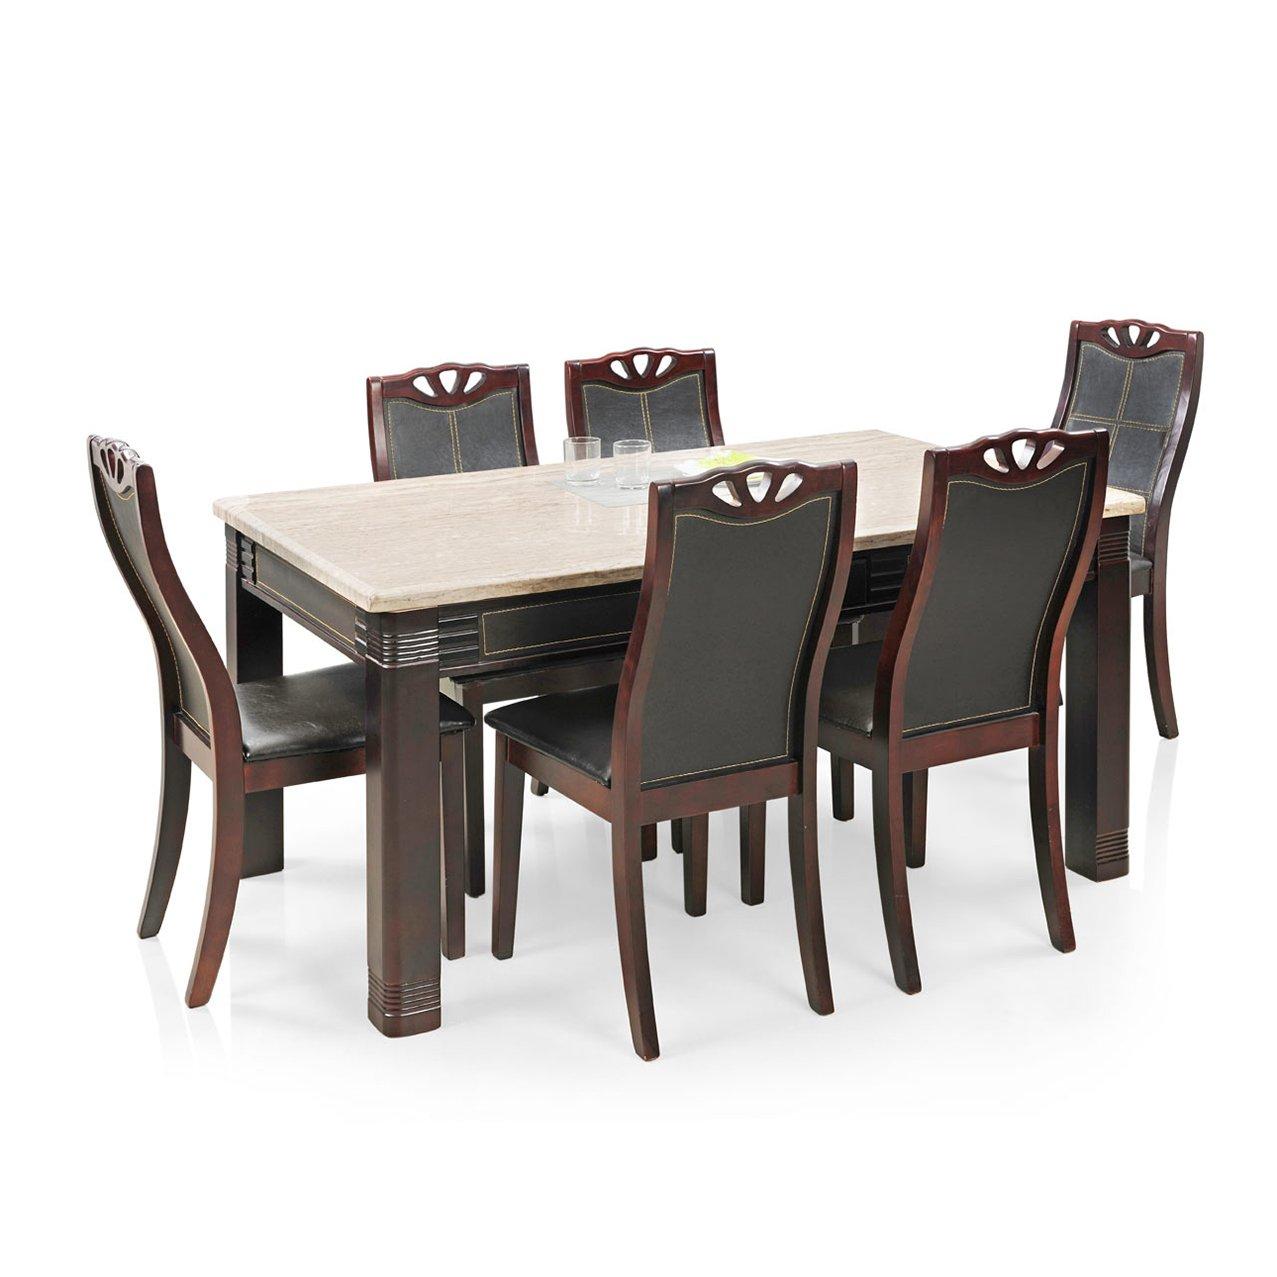 Royal Oak Lotus Six Seater Dining Table Set Rosewood  Amazon.in ...